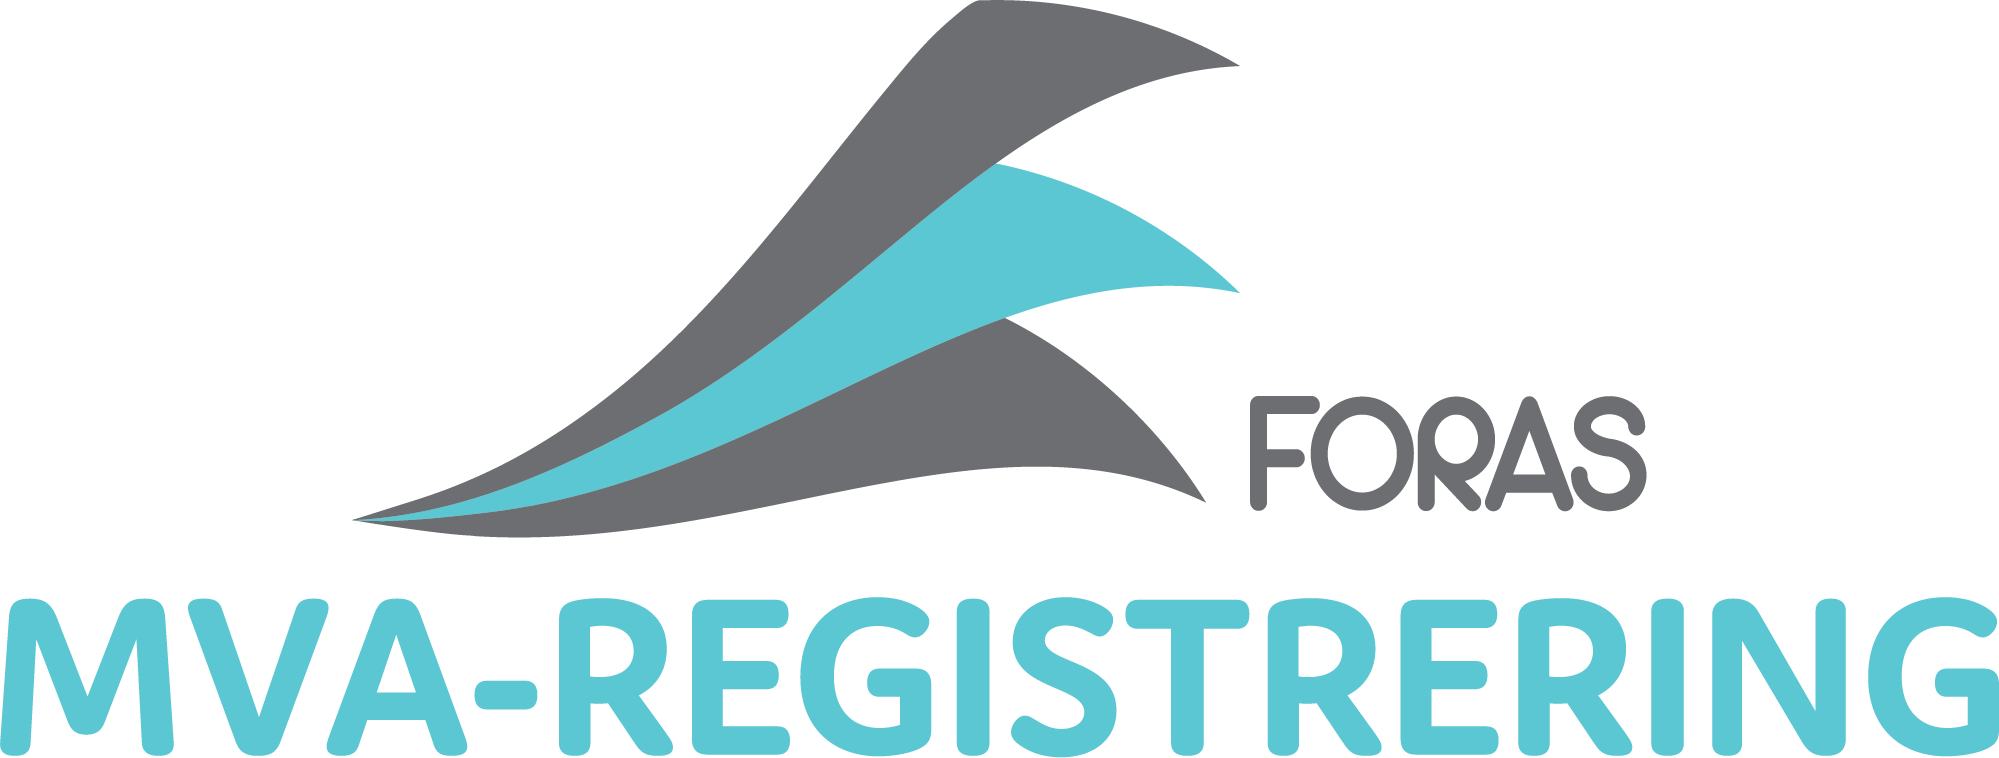 MVA-Registrering